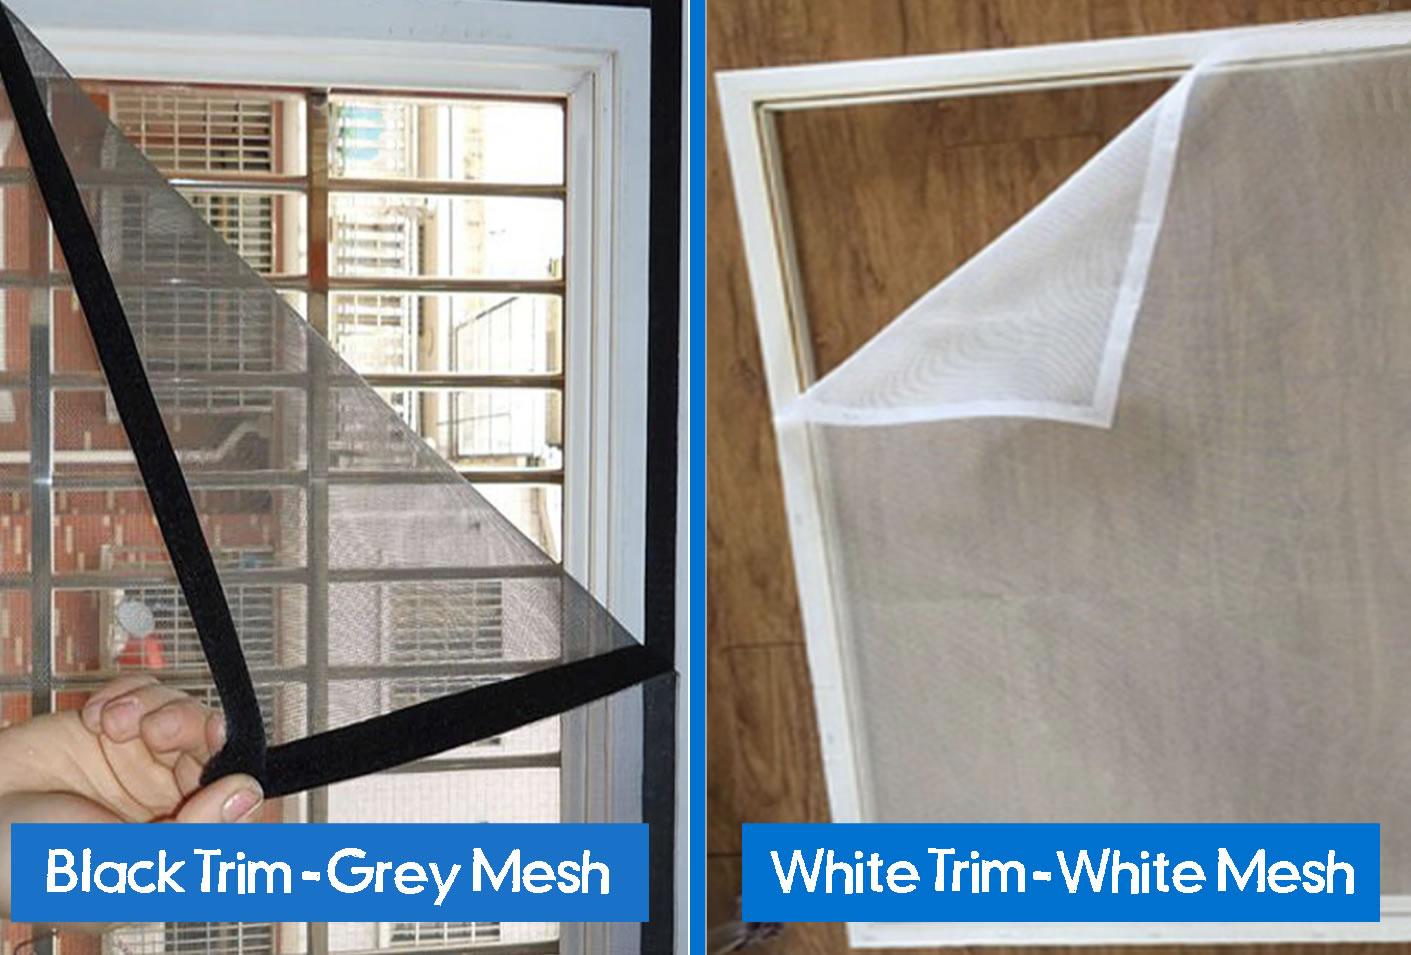 Diy Adjustable Window Screens The Cheapest Diy